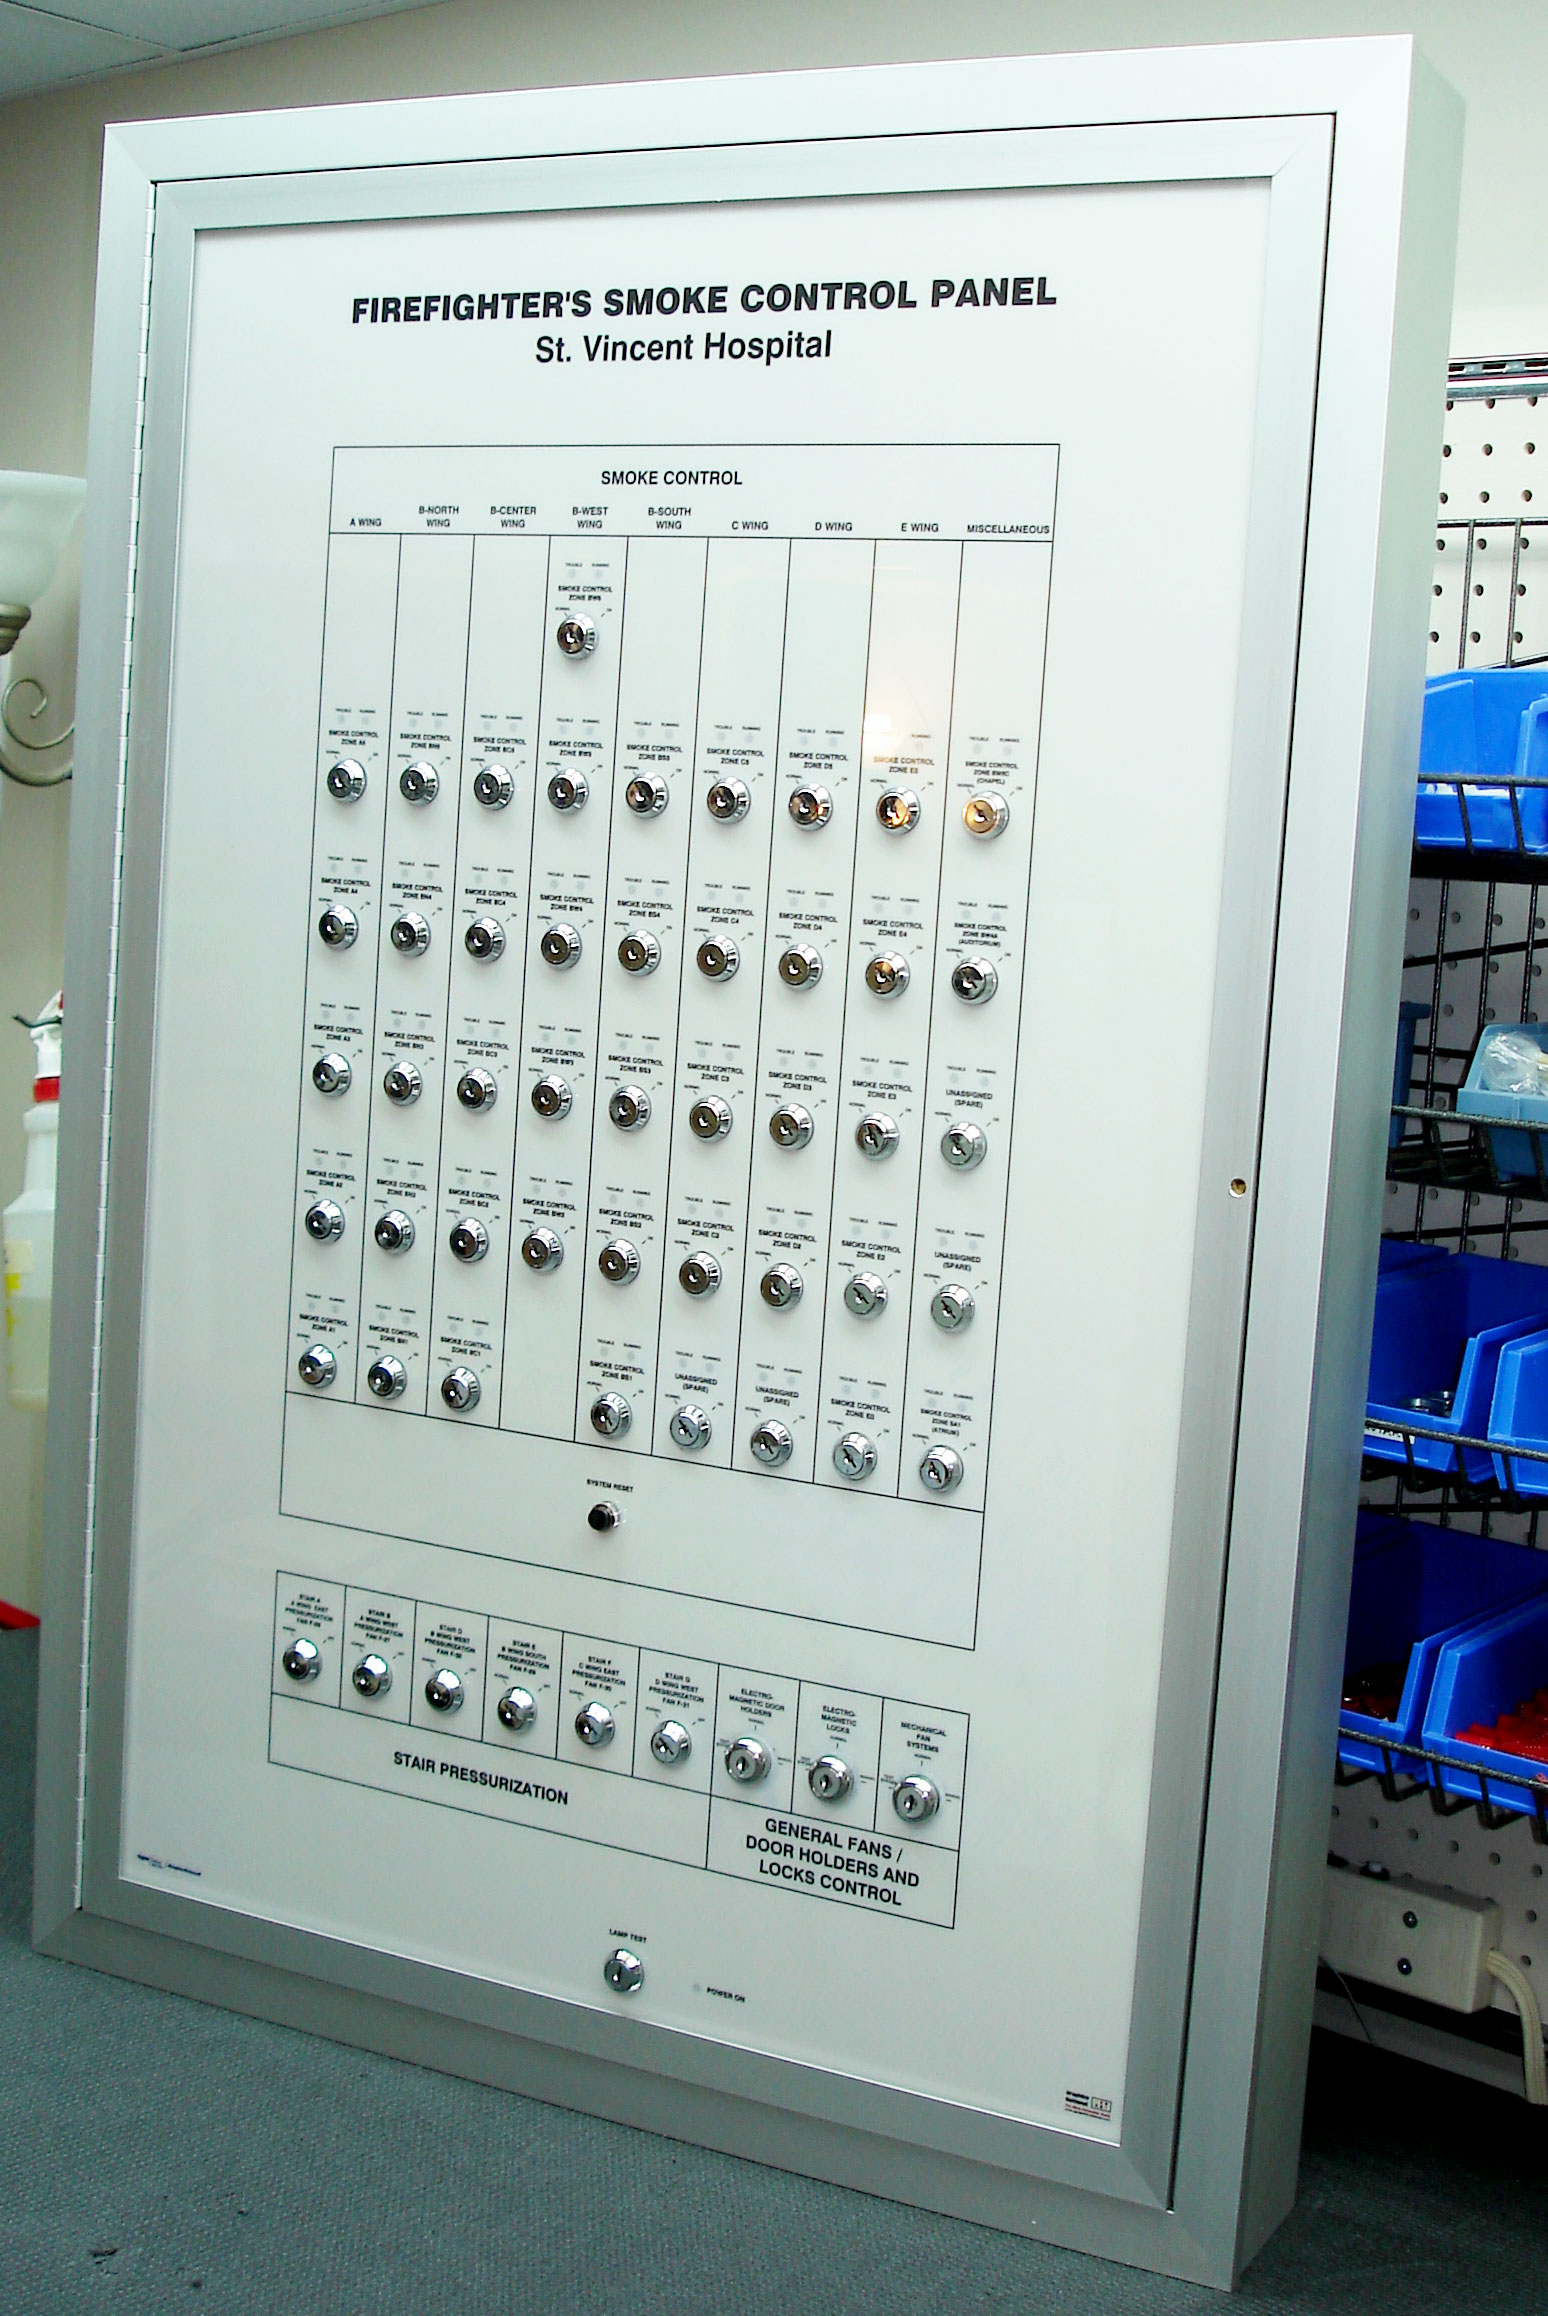 Smoke Control Panel - Keyed Switches